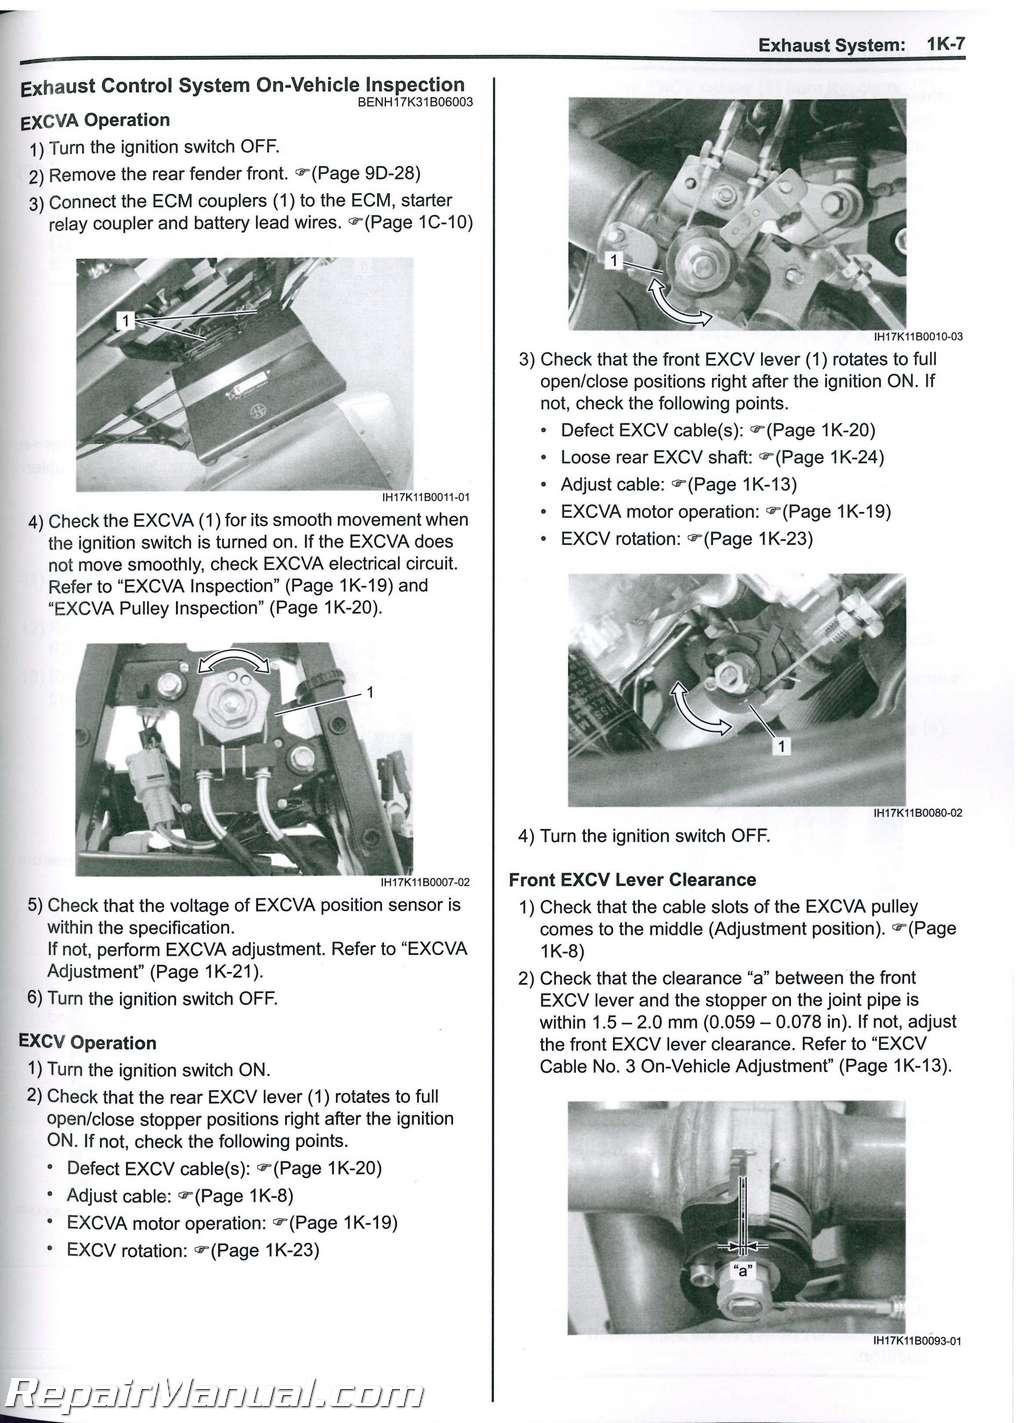 2017 2018 Suzuki Gsx R1000 Motorcycle Service Manual